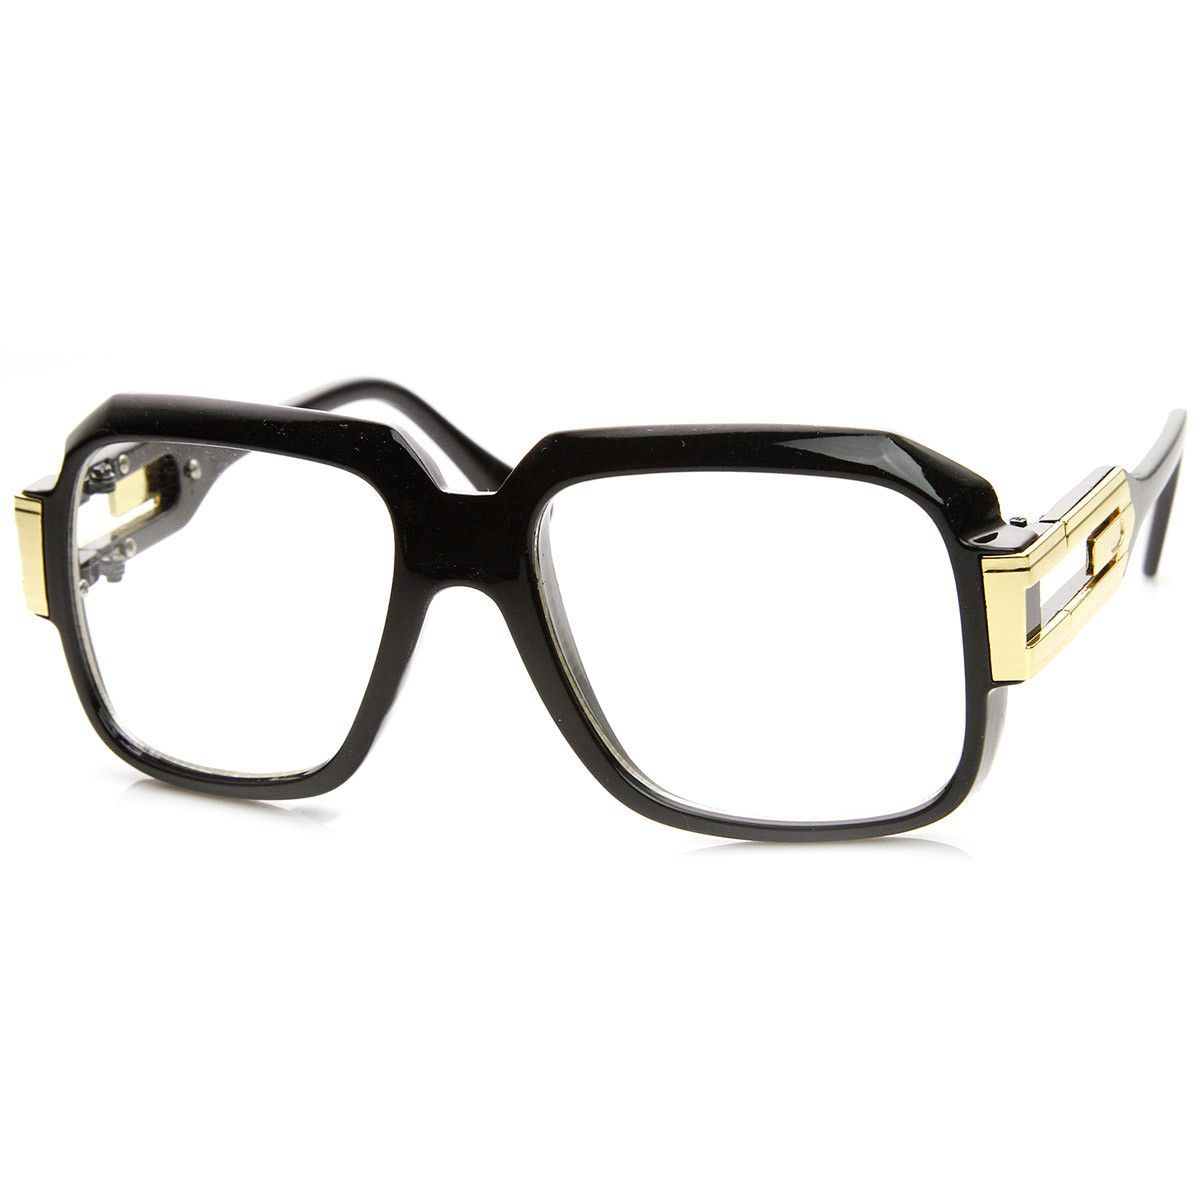 8b03ccc5d122 Large Classic Retro Square Frame RUN DMC Clear Lens Glasses ...